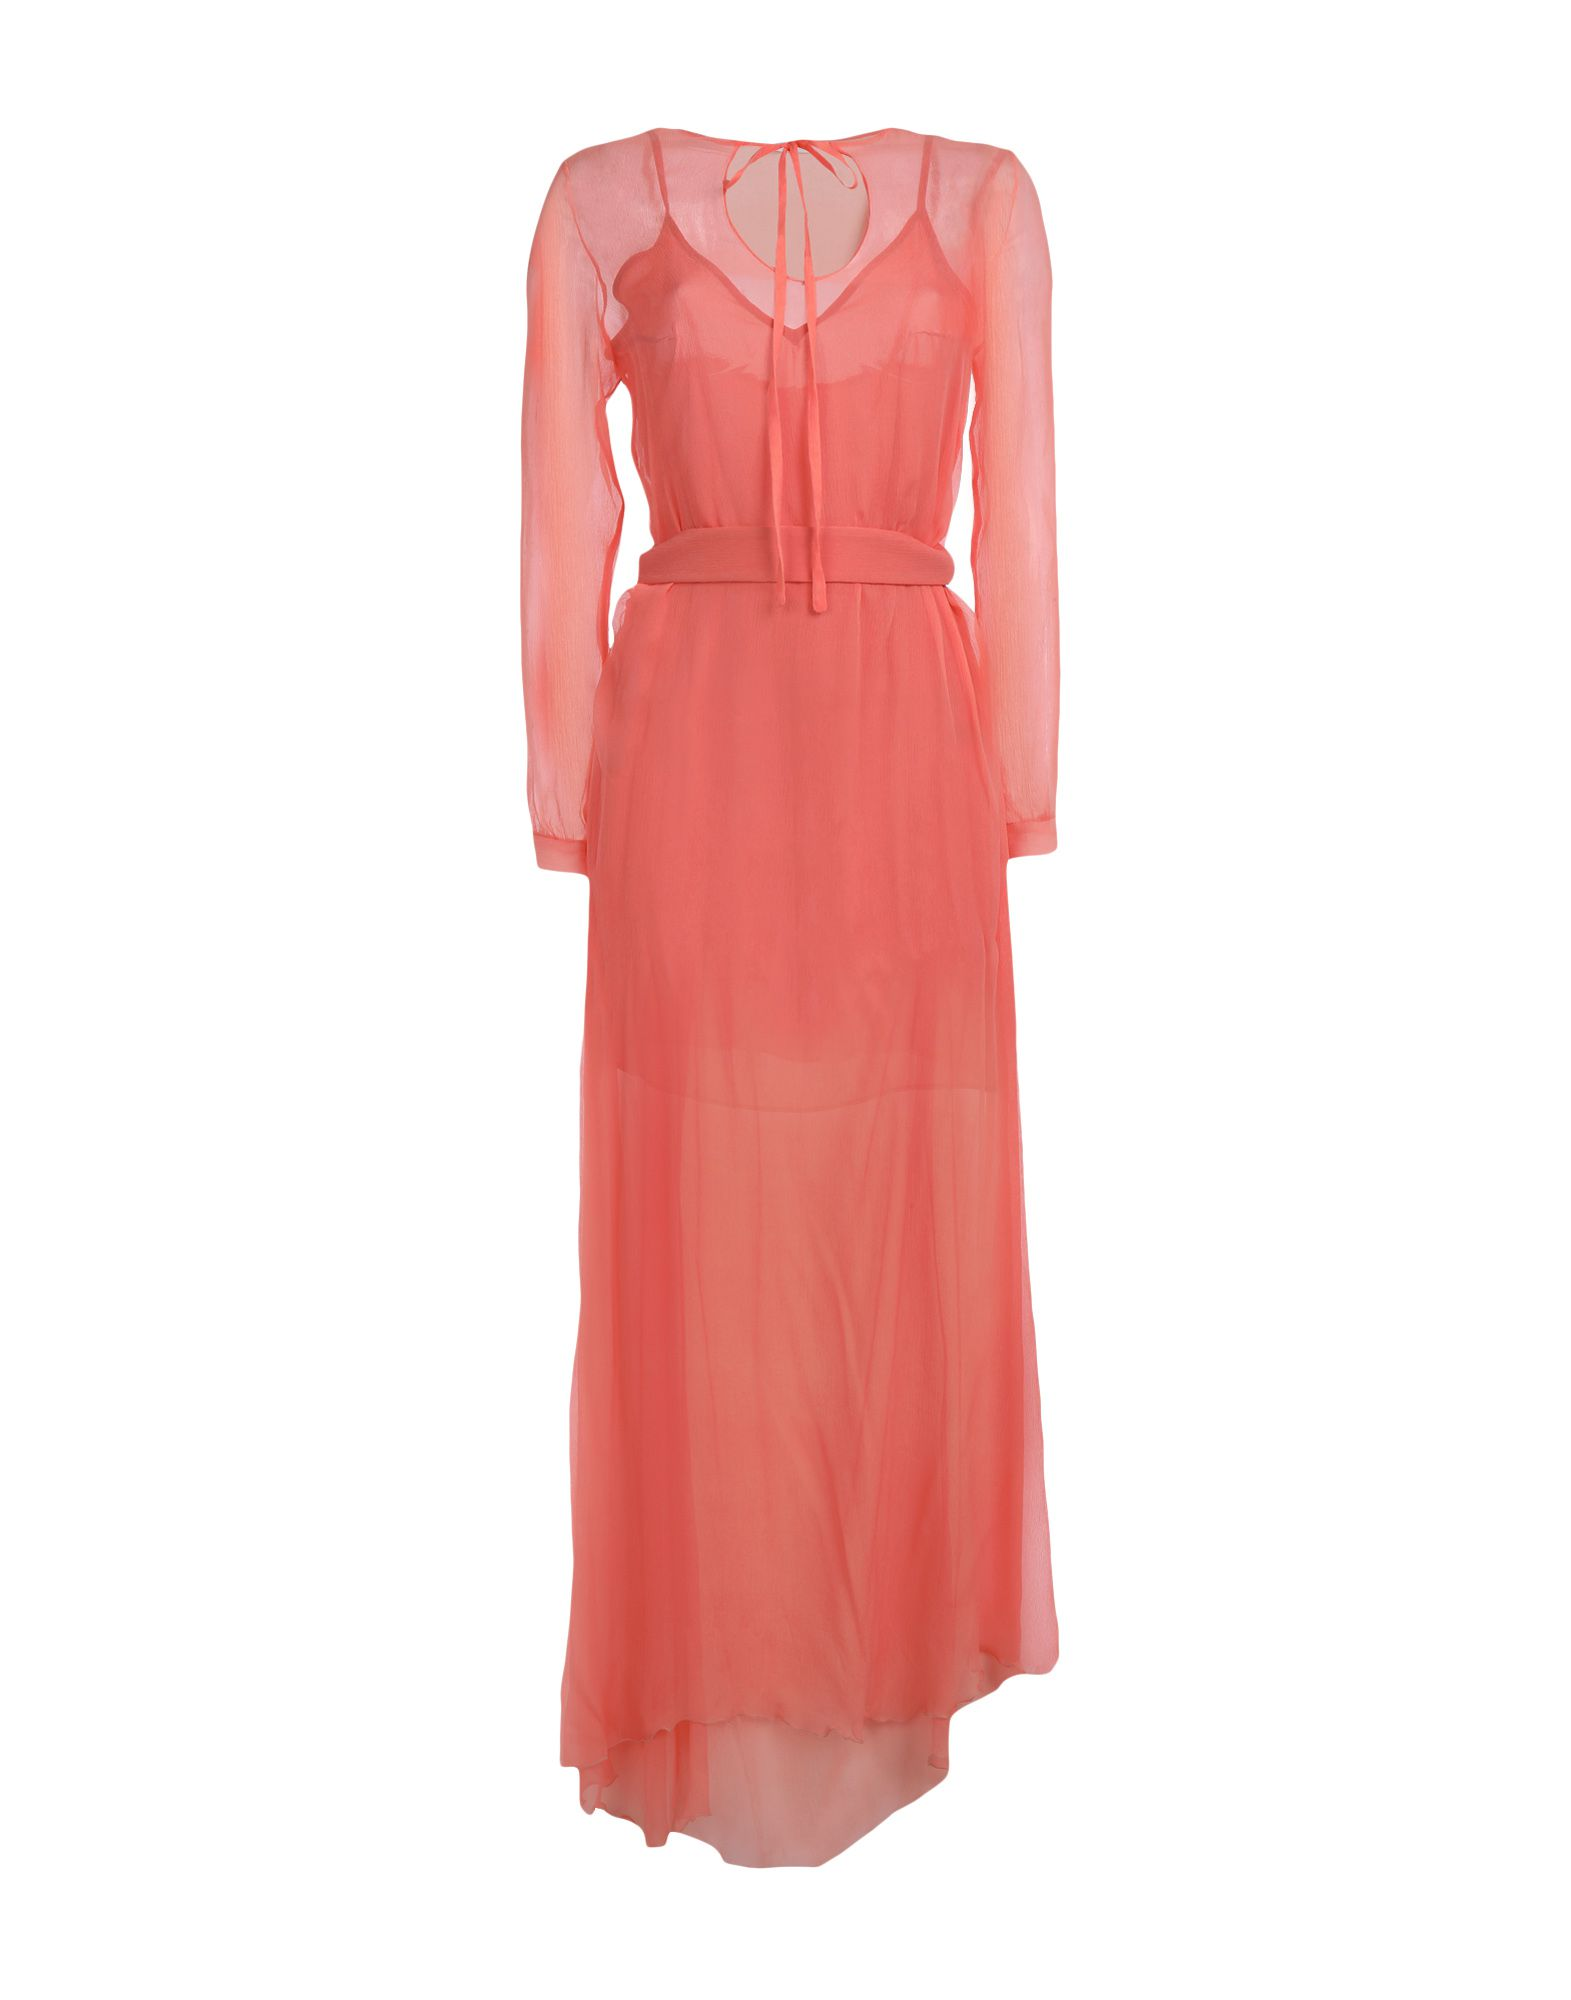 ALEX VIDAL Длинное платье платье alex lu alex lu mp002xw0jbke